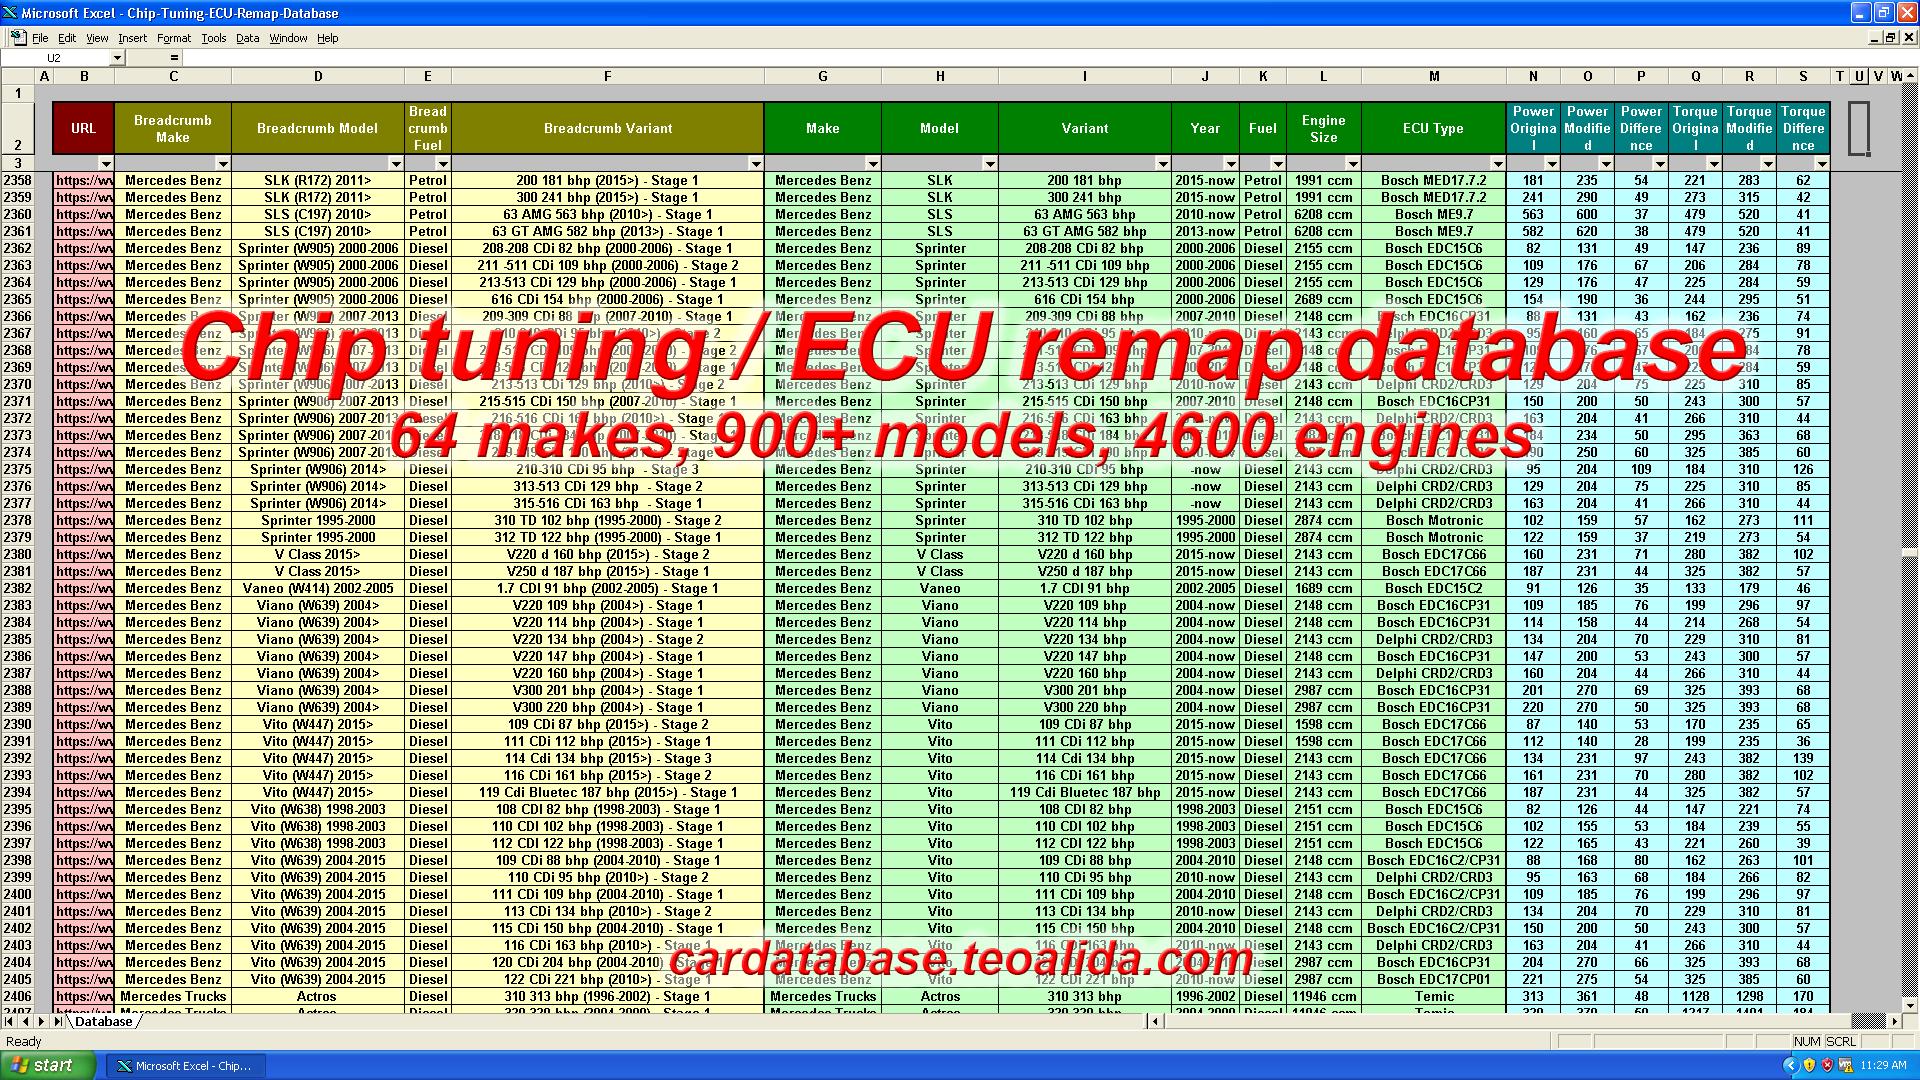 Chip tuning / ECU remap database | Car Database